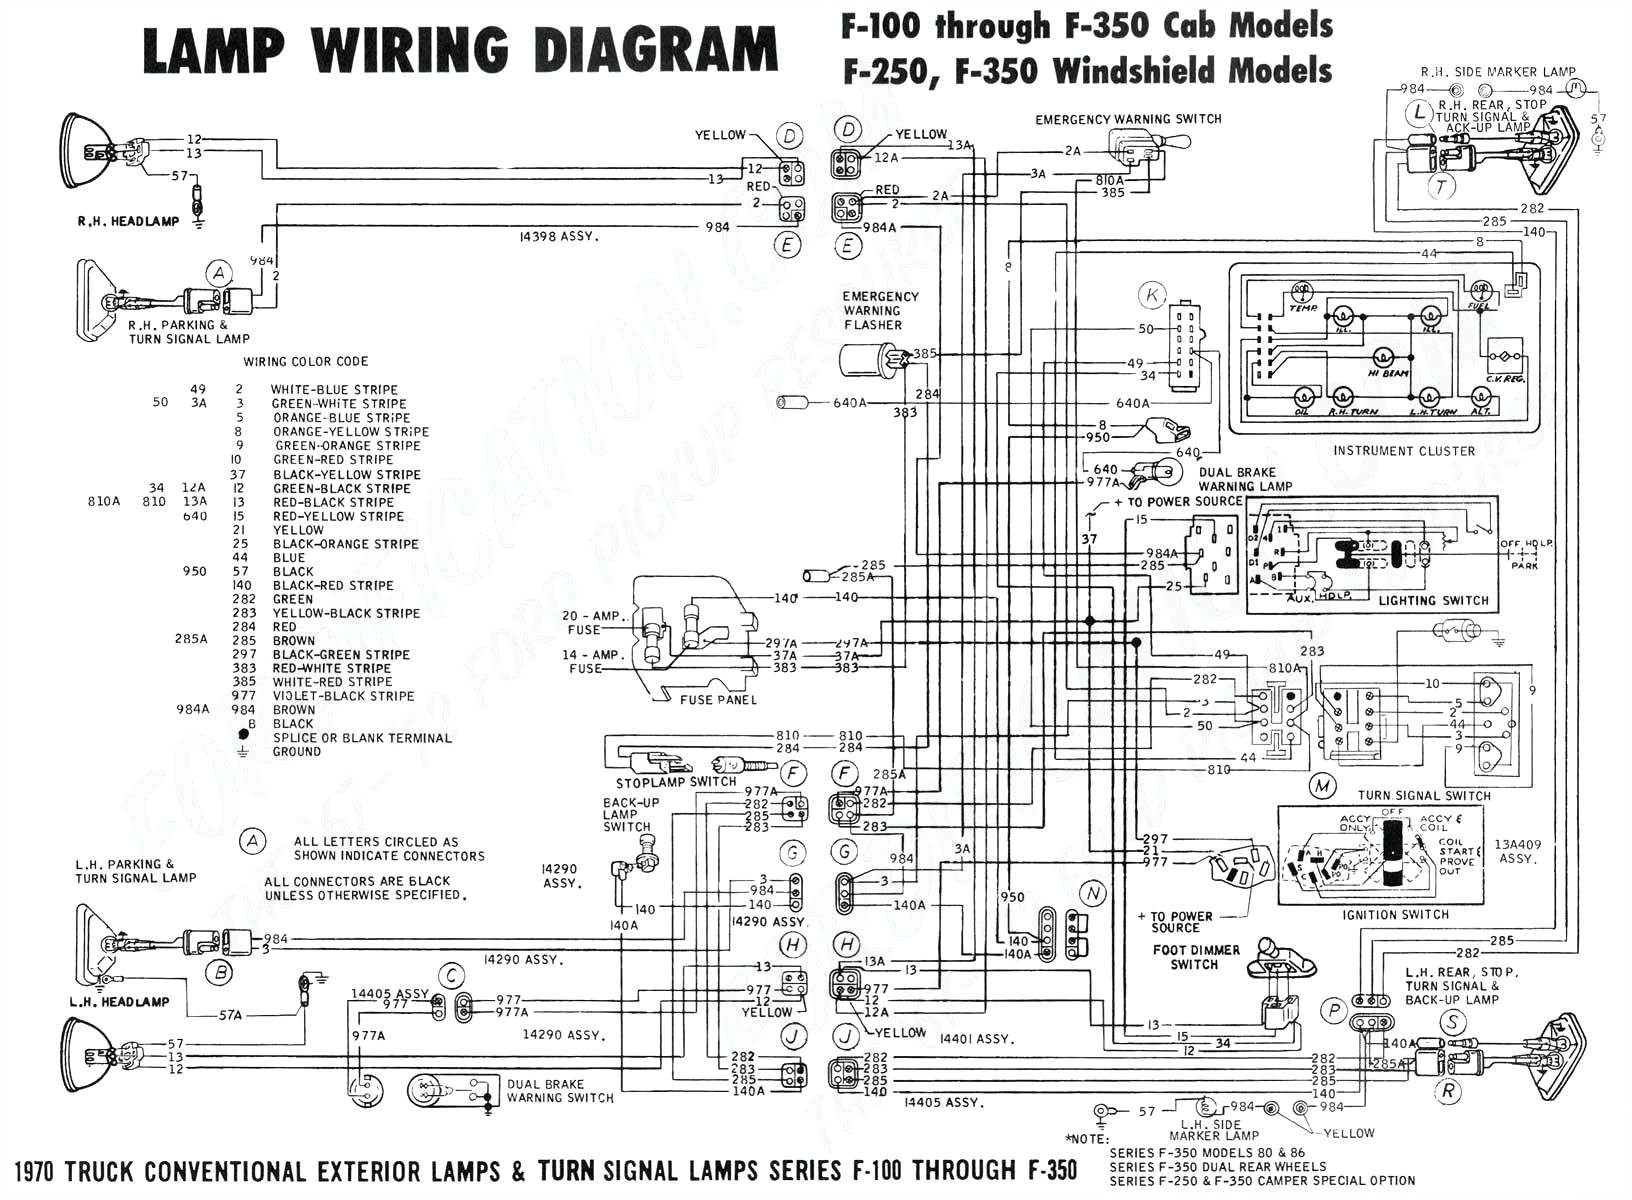 Acs Ignition Switch Wiring Diagram Abb Ach 501 Wiring Diagram Data Schematic Diagram